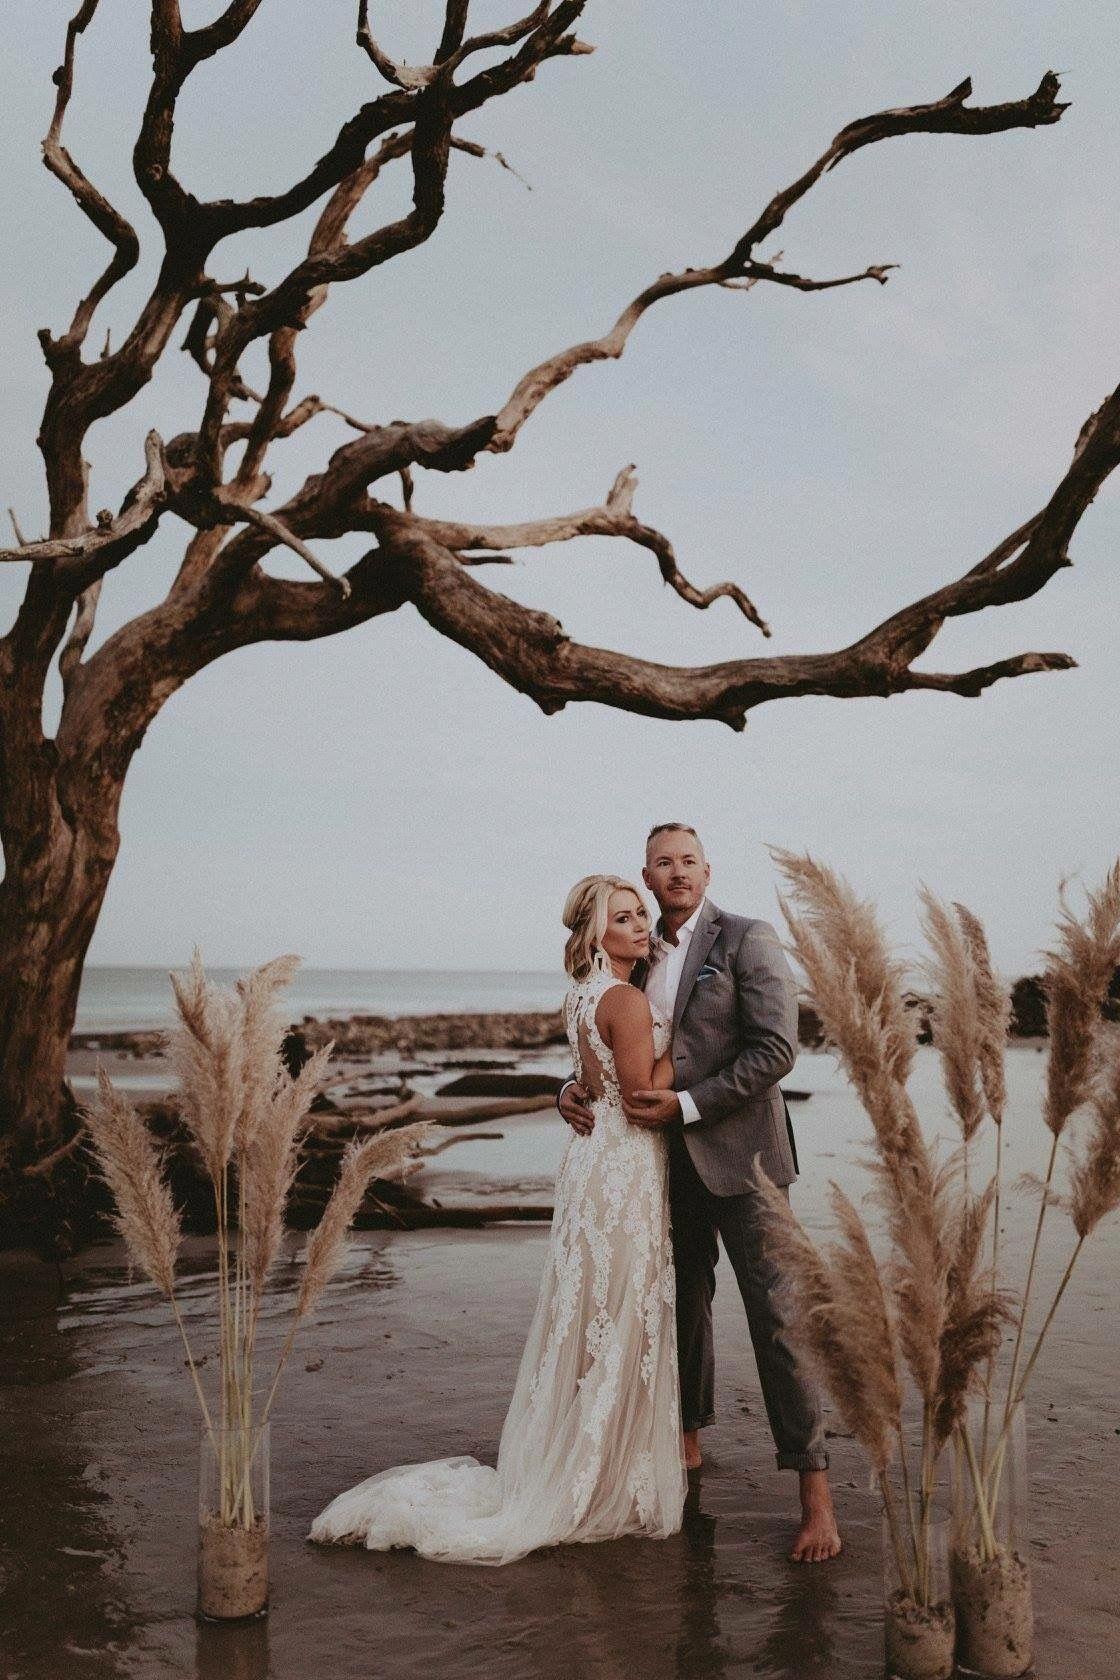 Driftwood Beach Wedding Beach Wedding Locations Beach Wedding Beautiful Beach Wedding